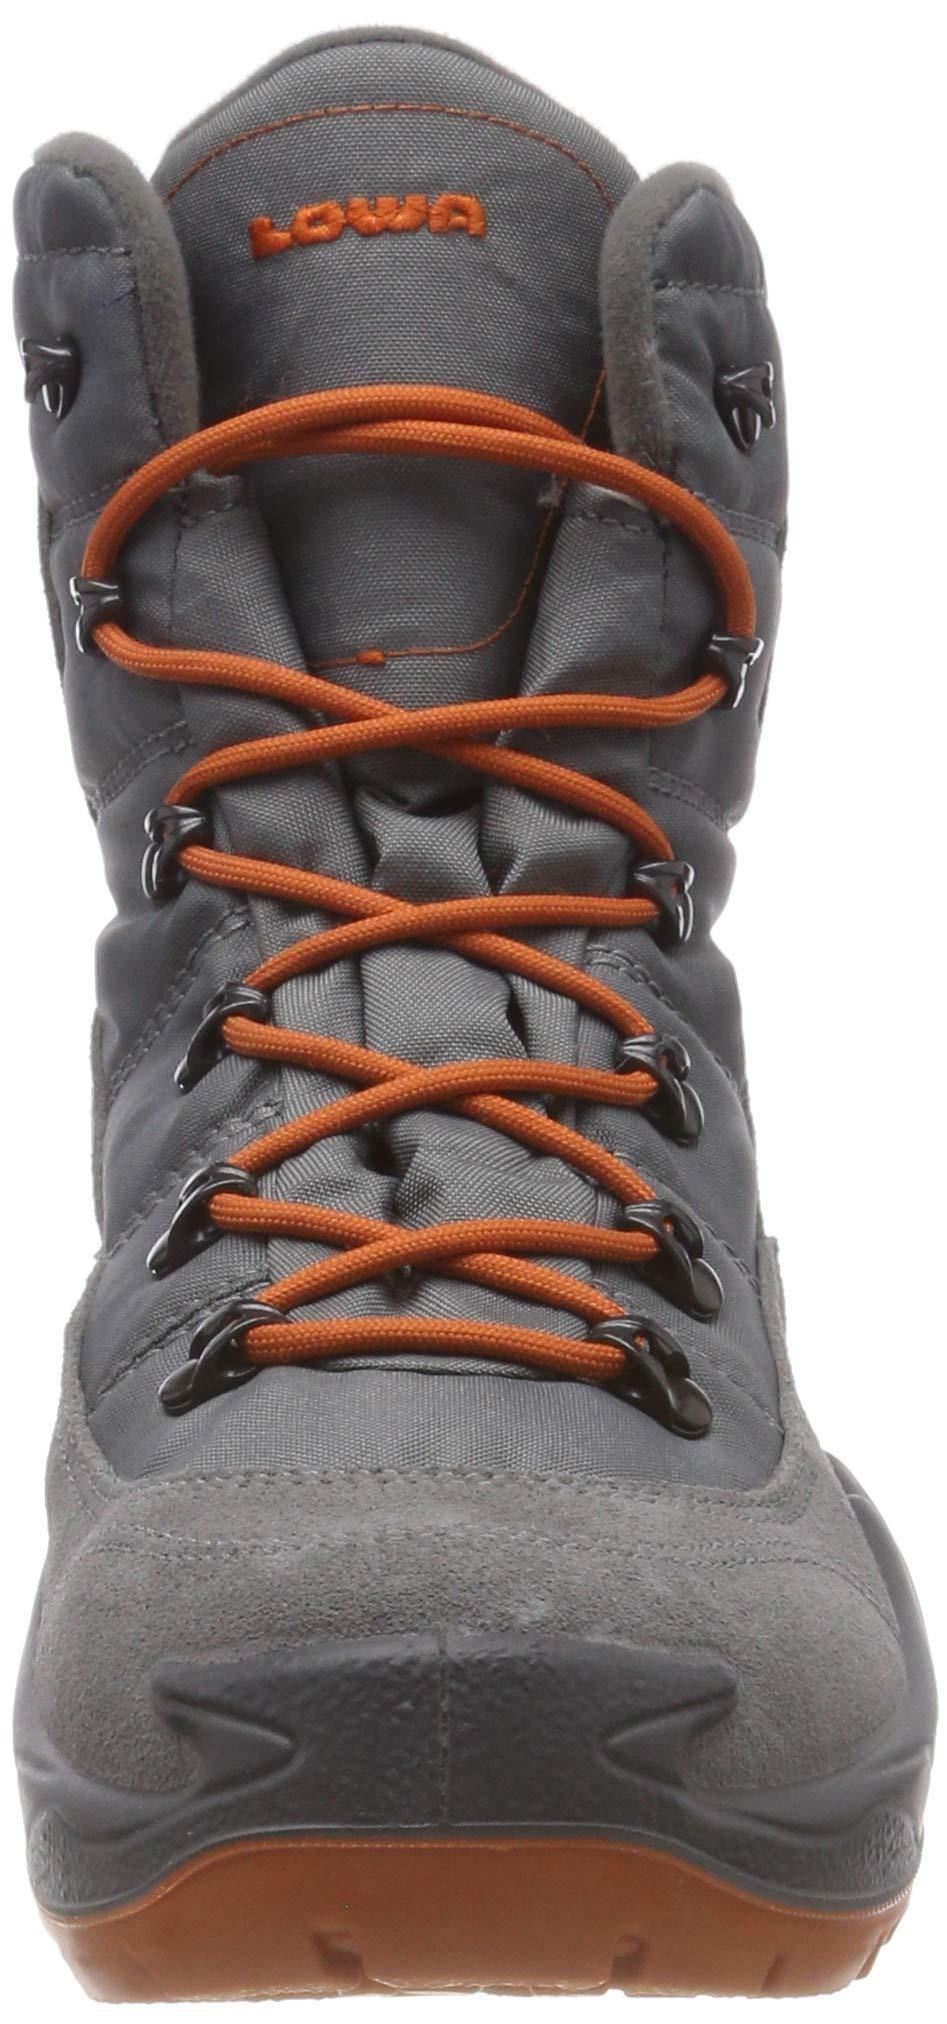 Lowa Unisex Kids Rufus Iii GTX Hi High Rise Hiking Boots 4